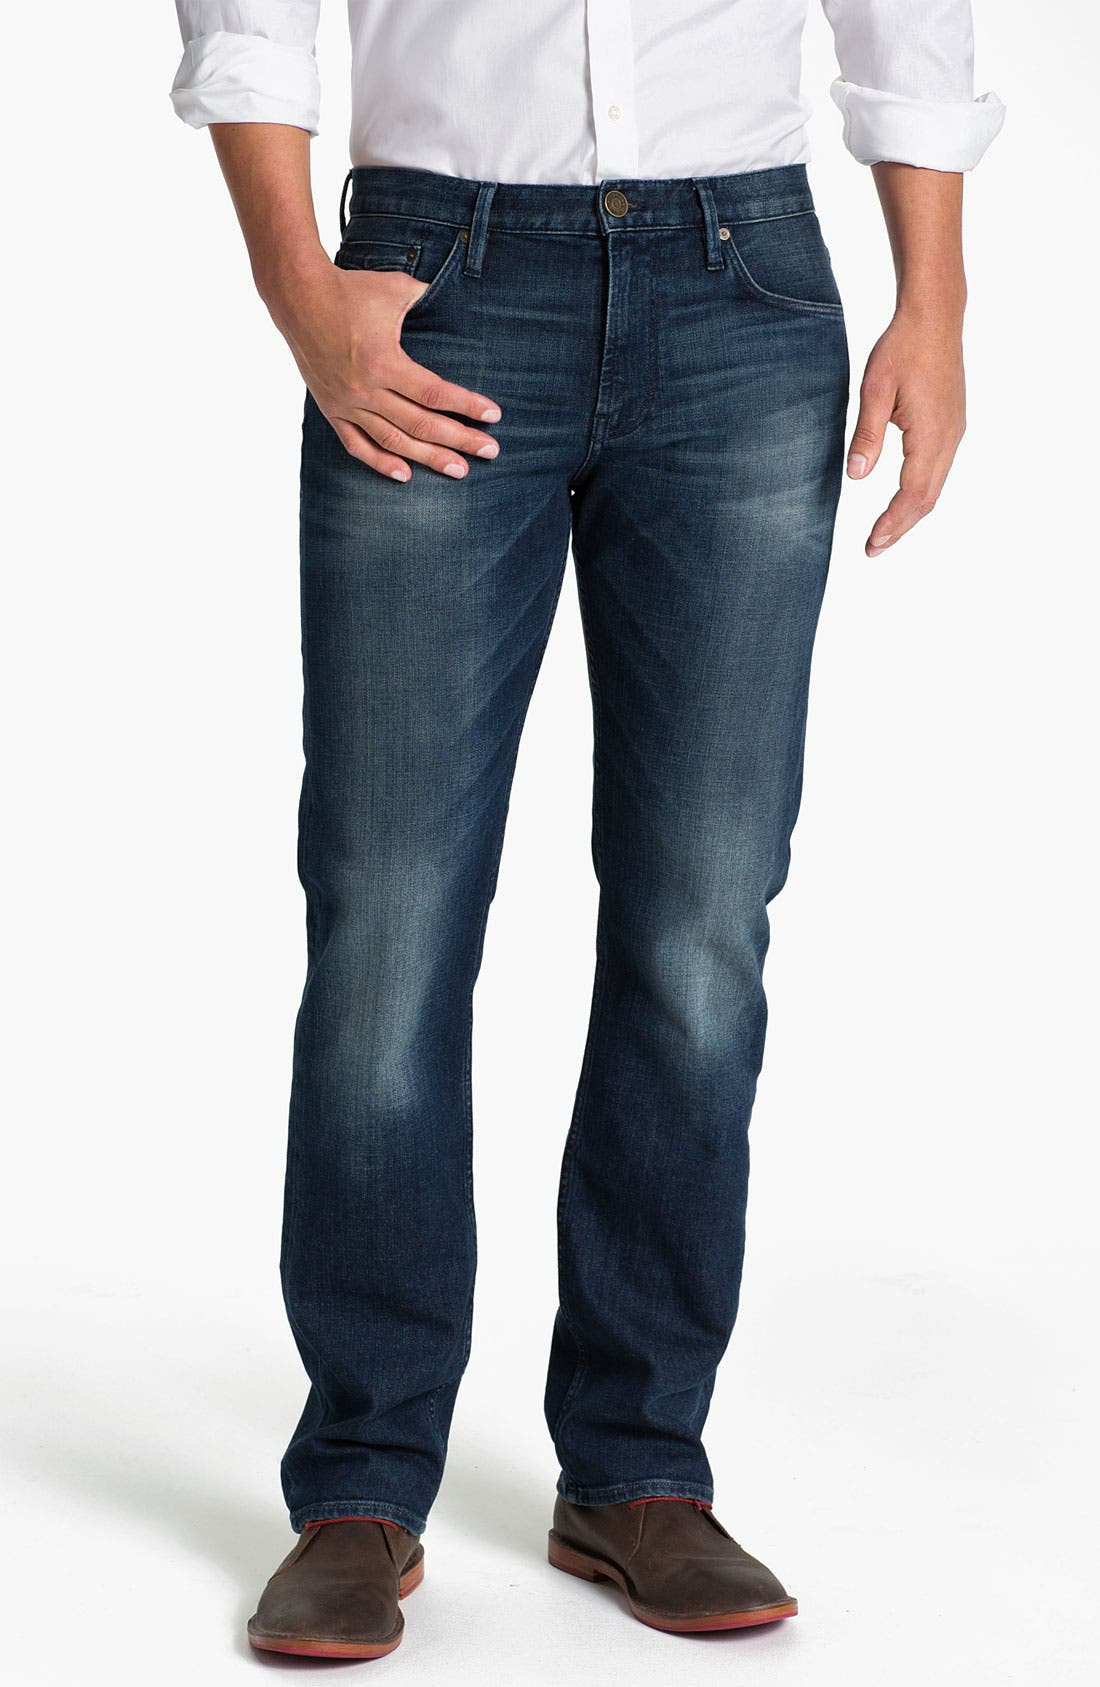 Alternate Image 1 Selected - Burberry Brit 'Cavendish' Straight Leg Jeans (Denim Blue)